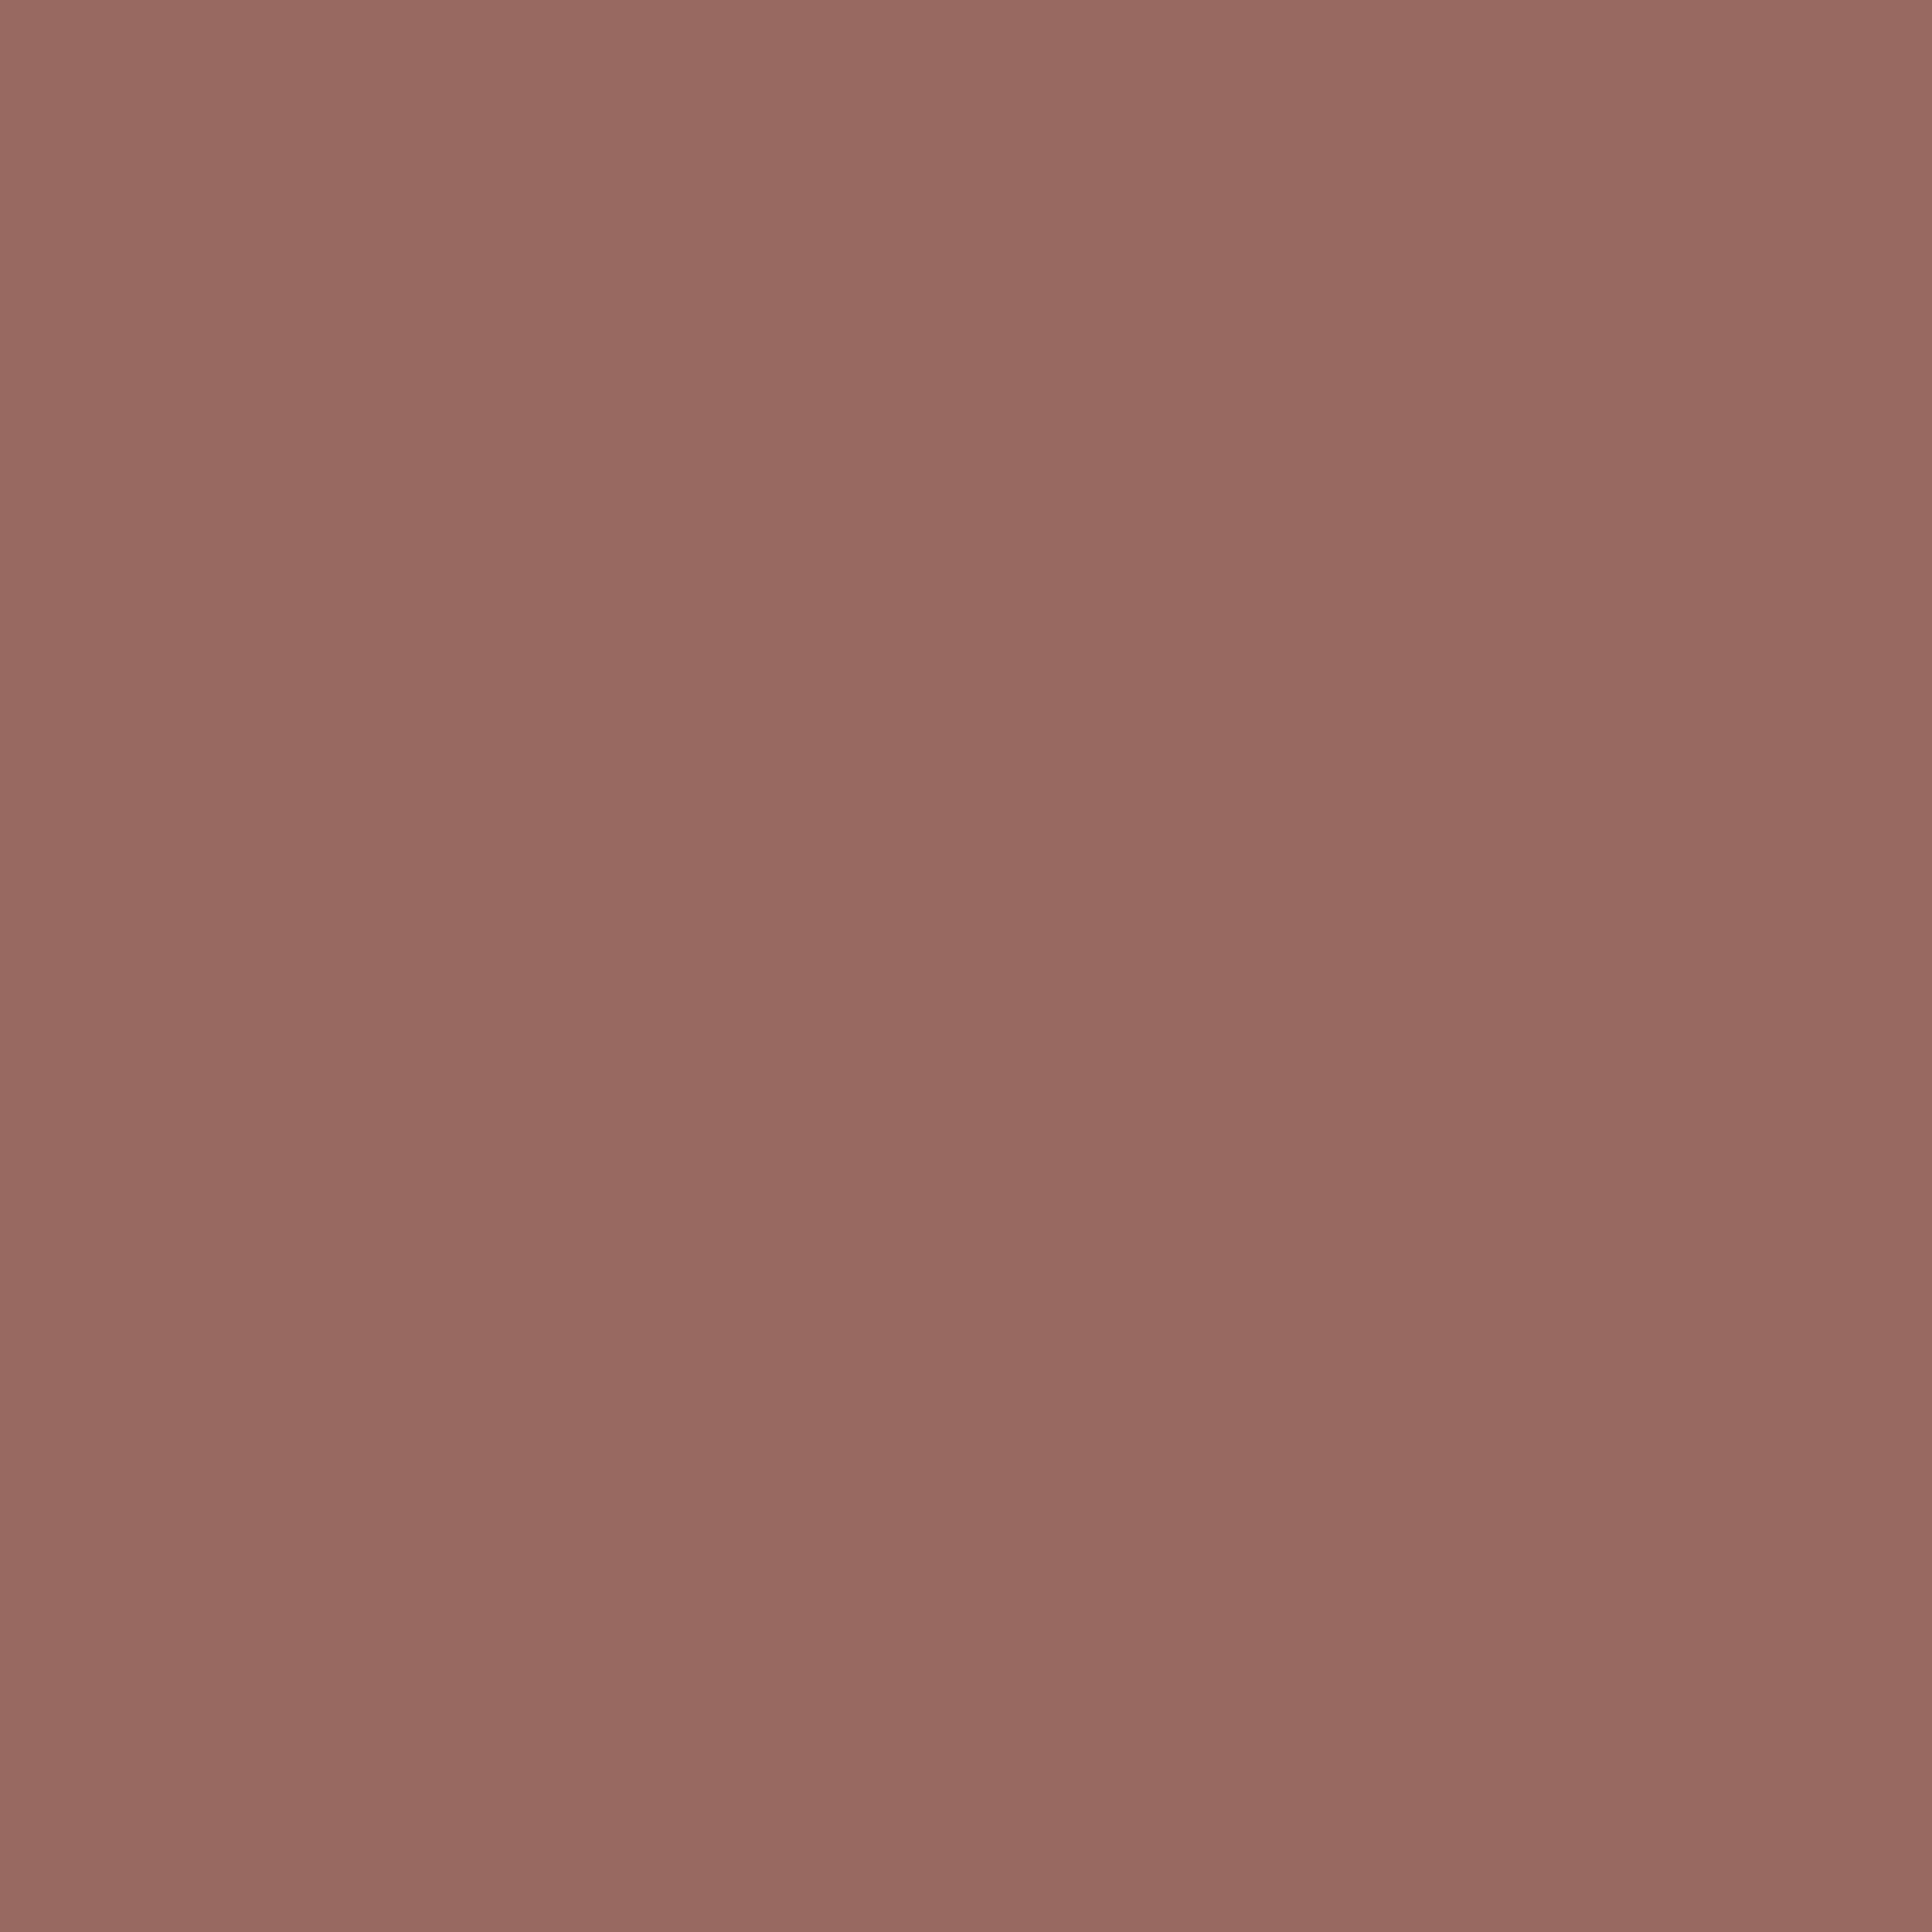 3600x3600 Dark Chestnut Solid Color Background